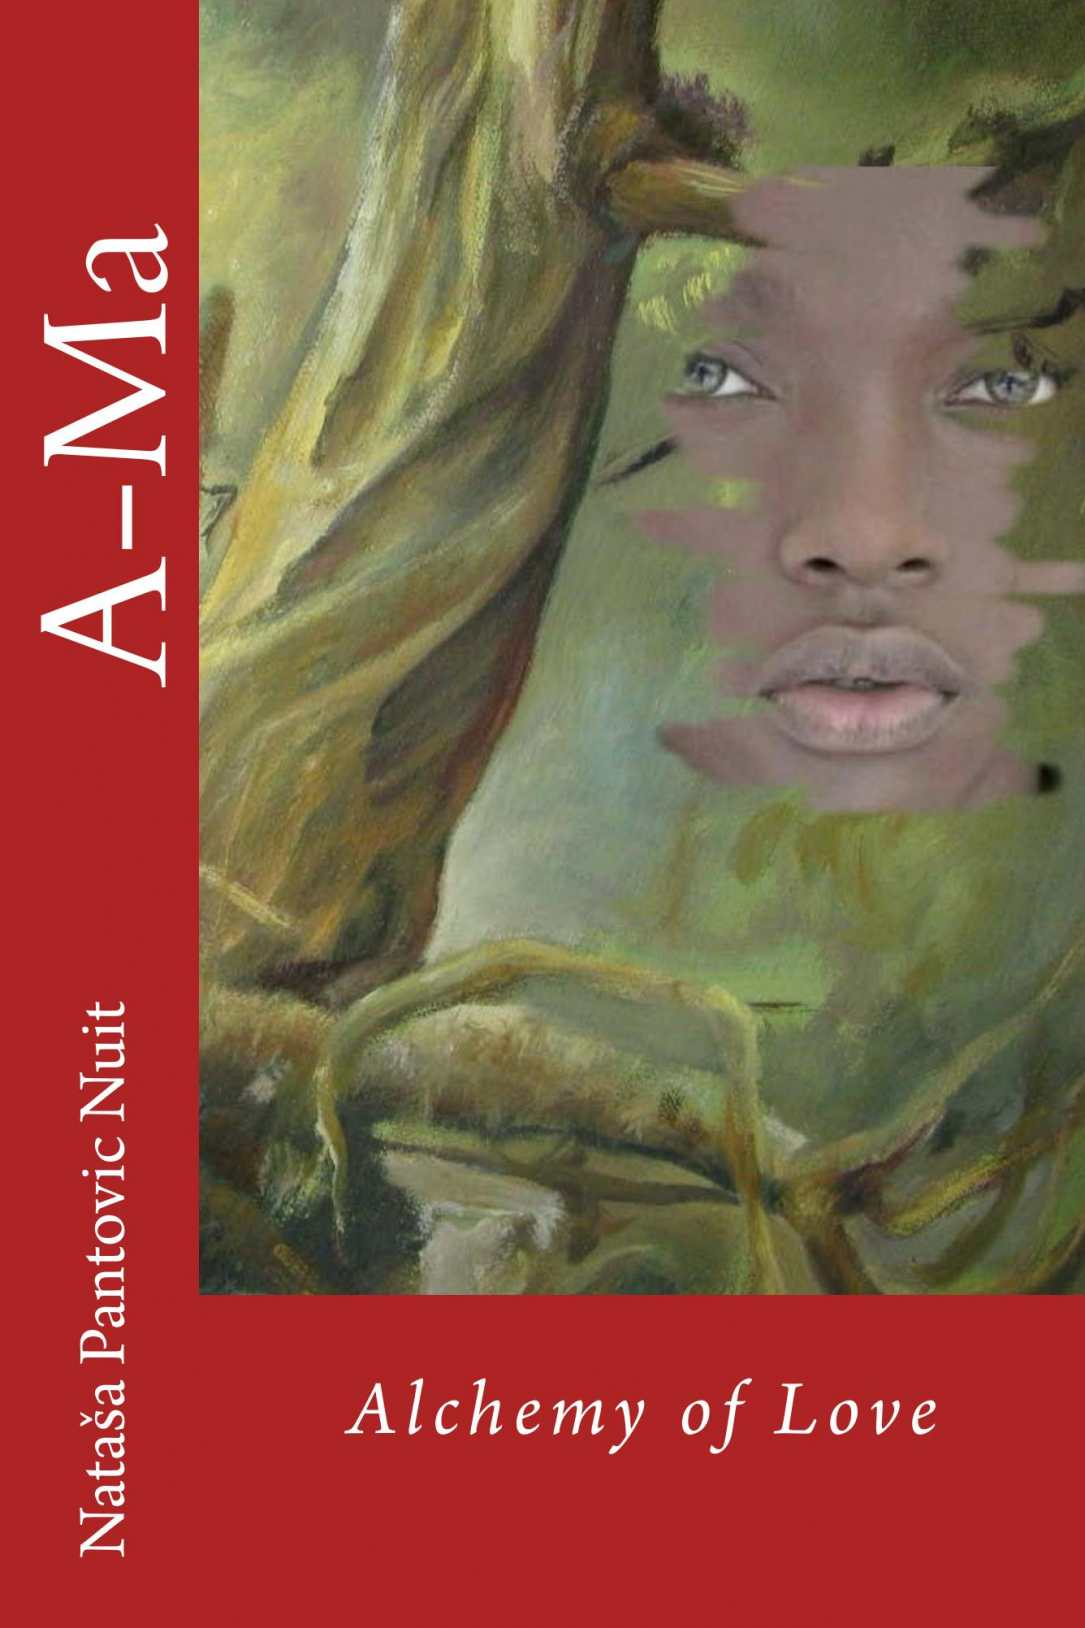 AMa Alchemy of Love Spiritual Novel by Nataša Pan